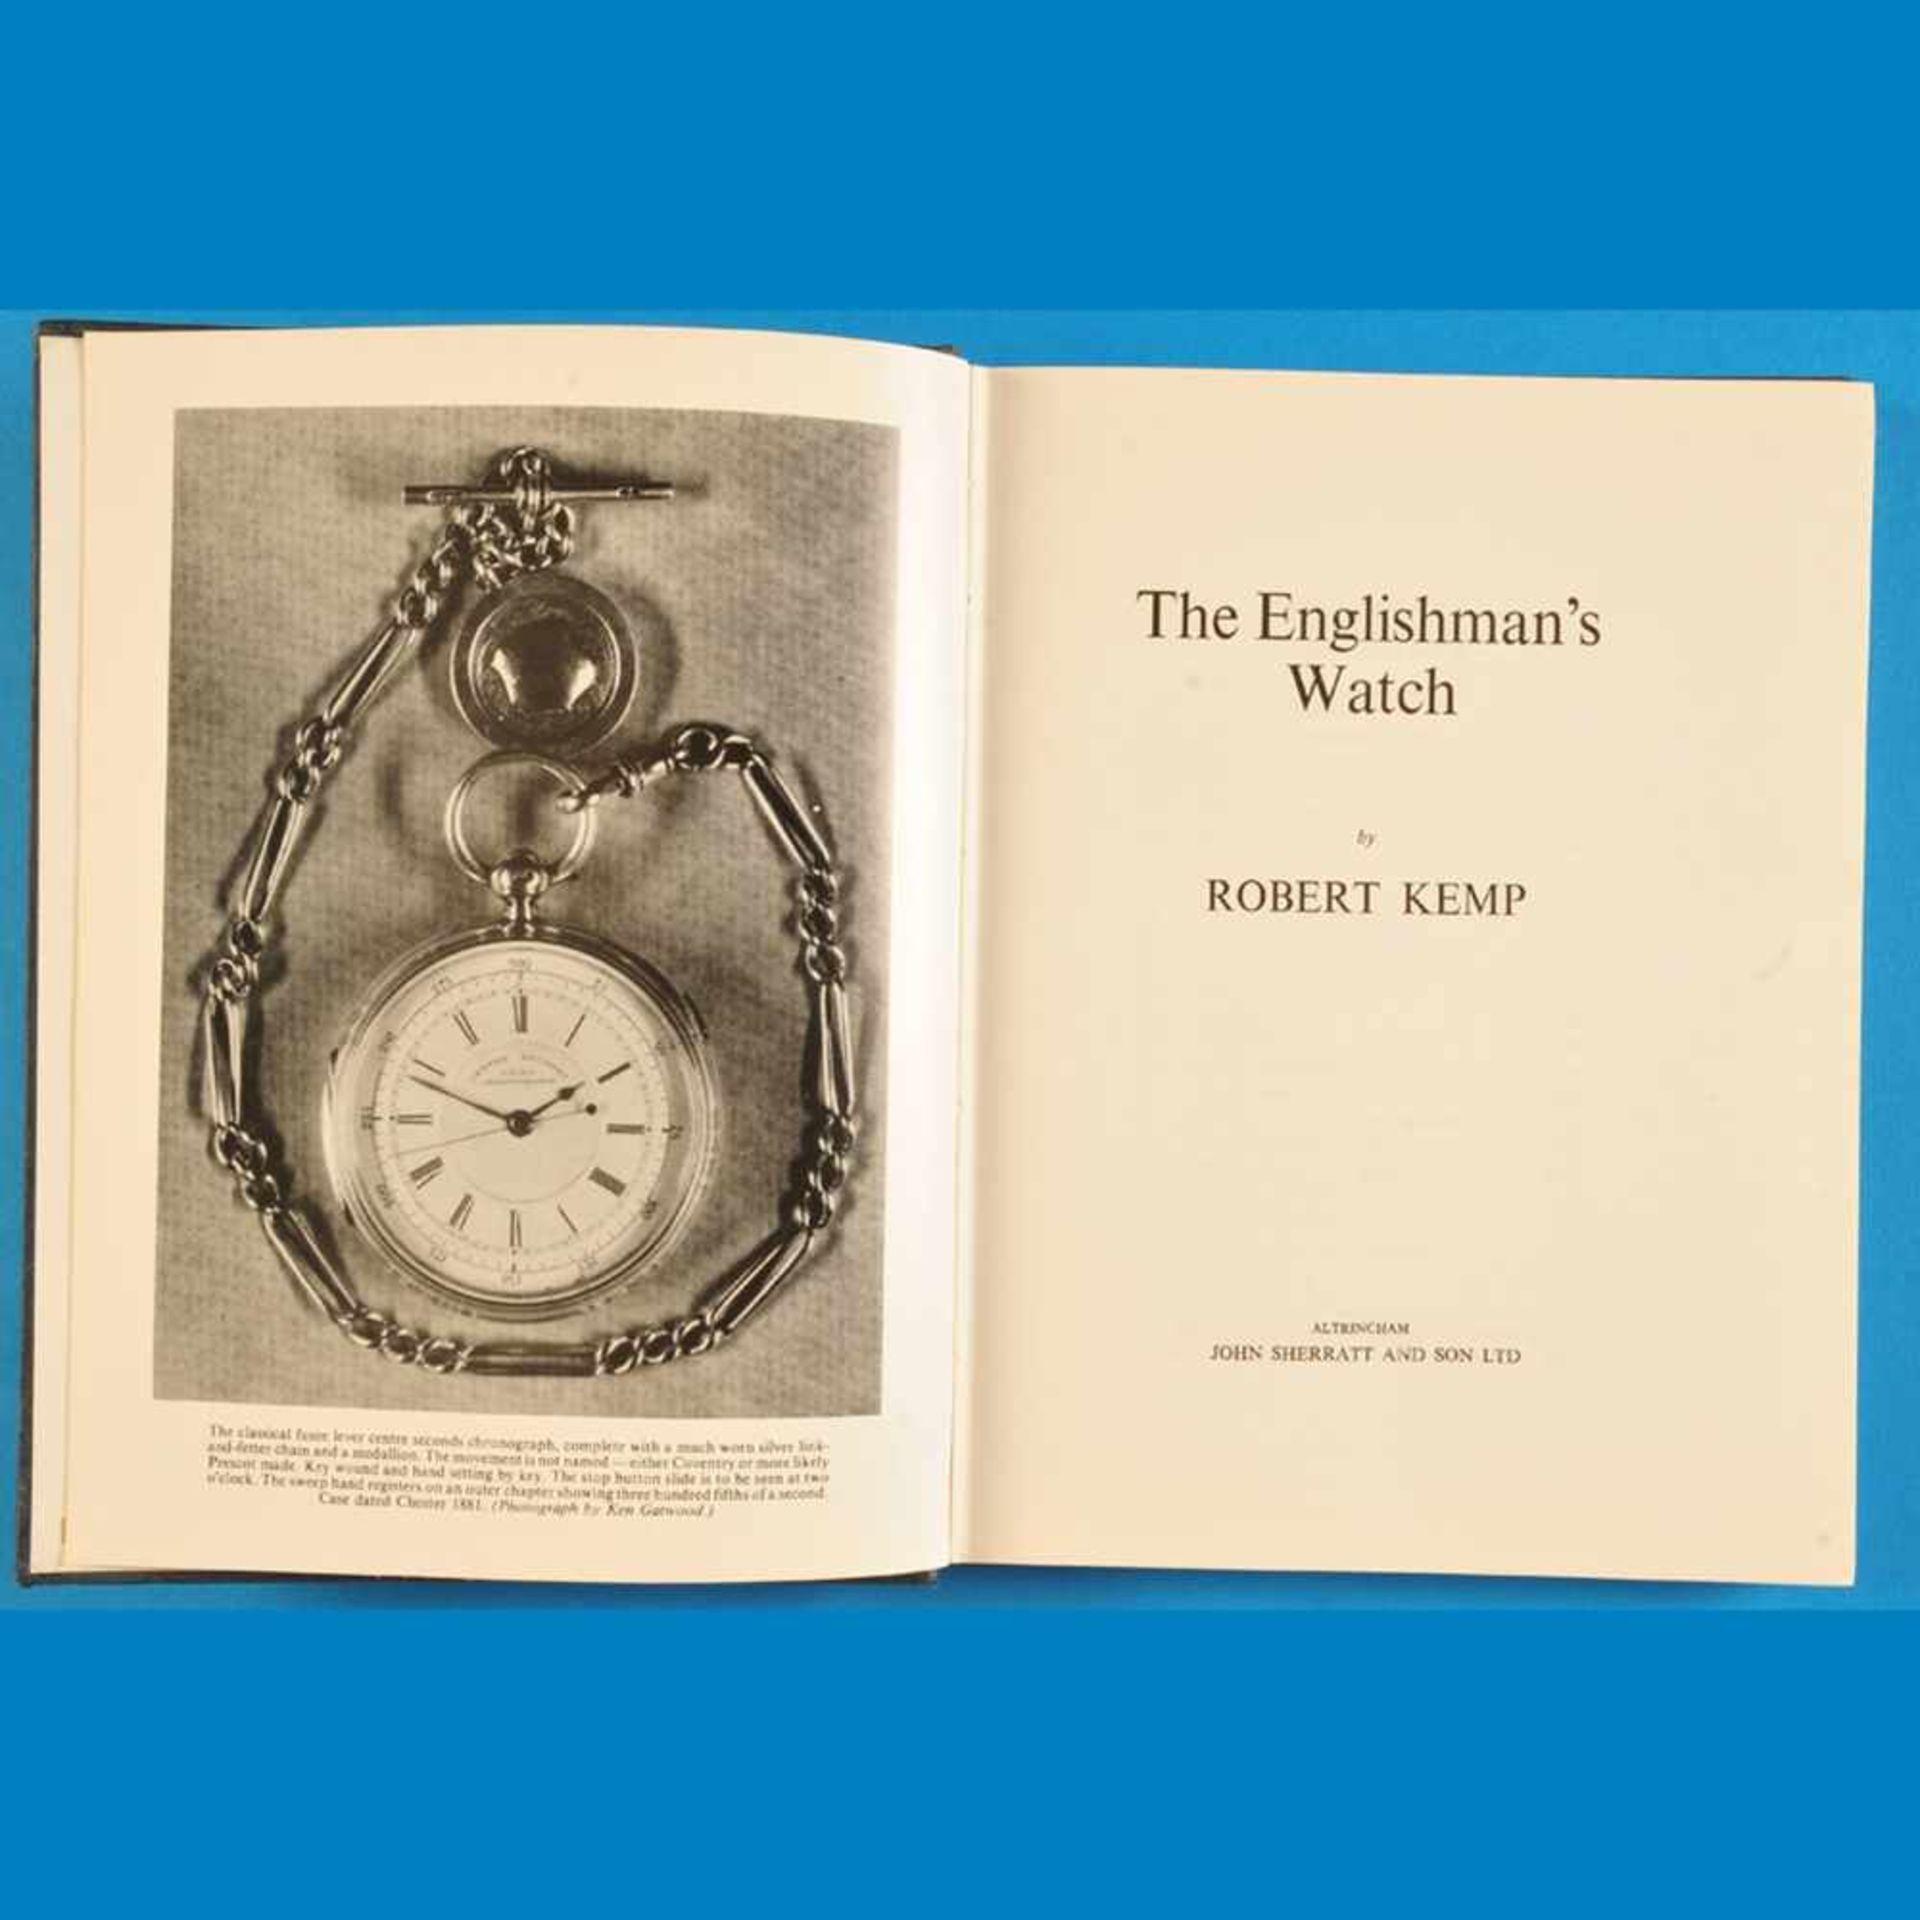 Robert Kemp, The Englishman's Watch, 1979Robert Kemp, The Englishman's Watch, 1979, 148 Tex